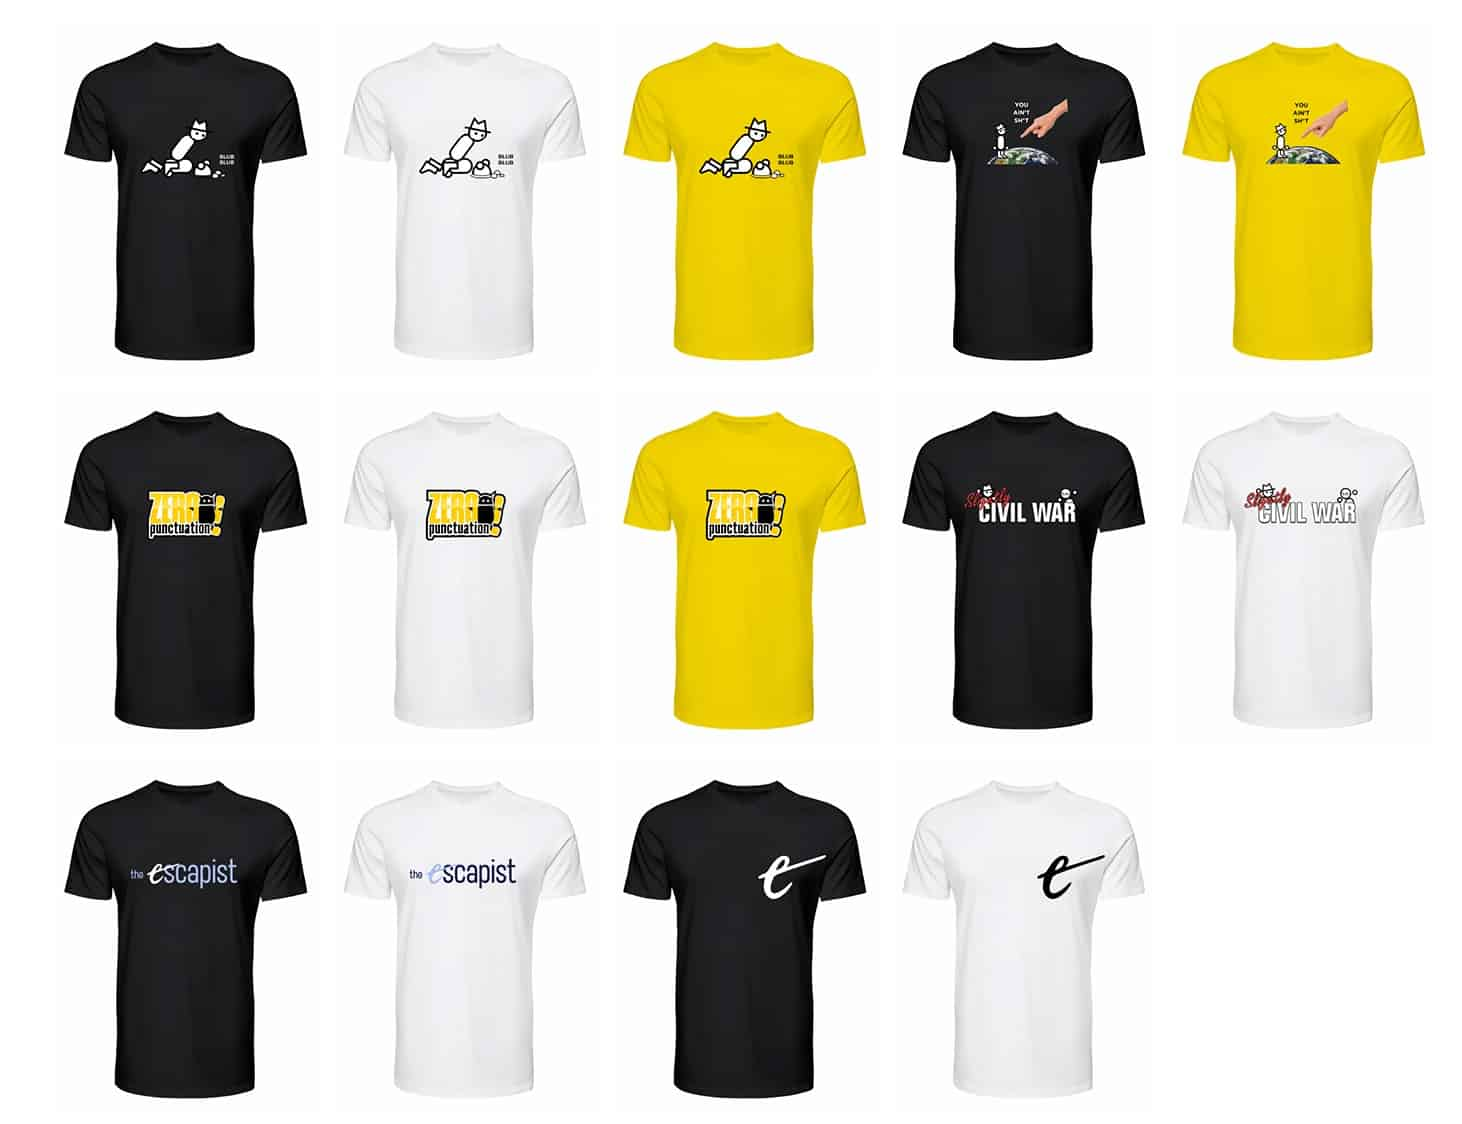 Escapist T-shirts at Teespring via YouTube